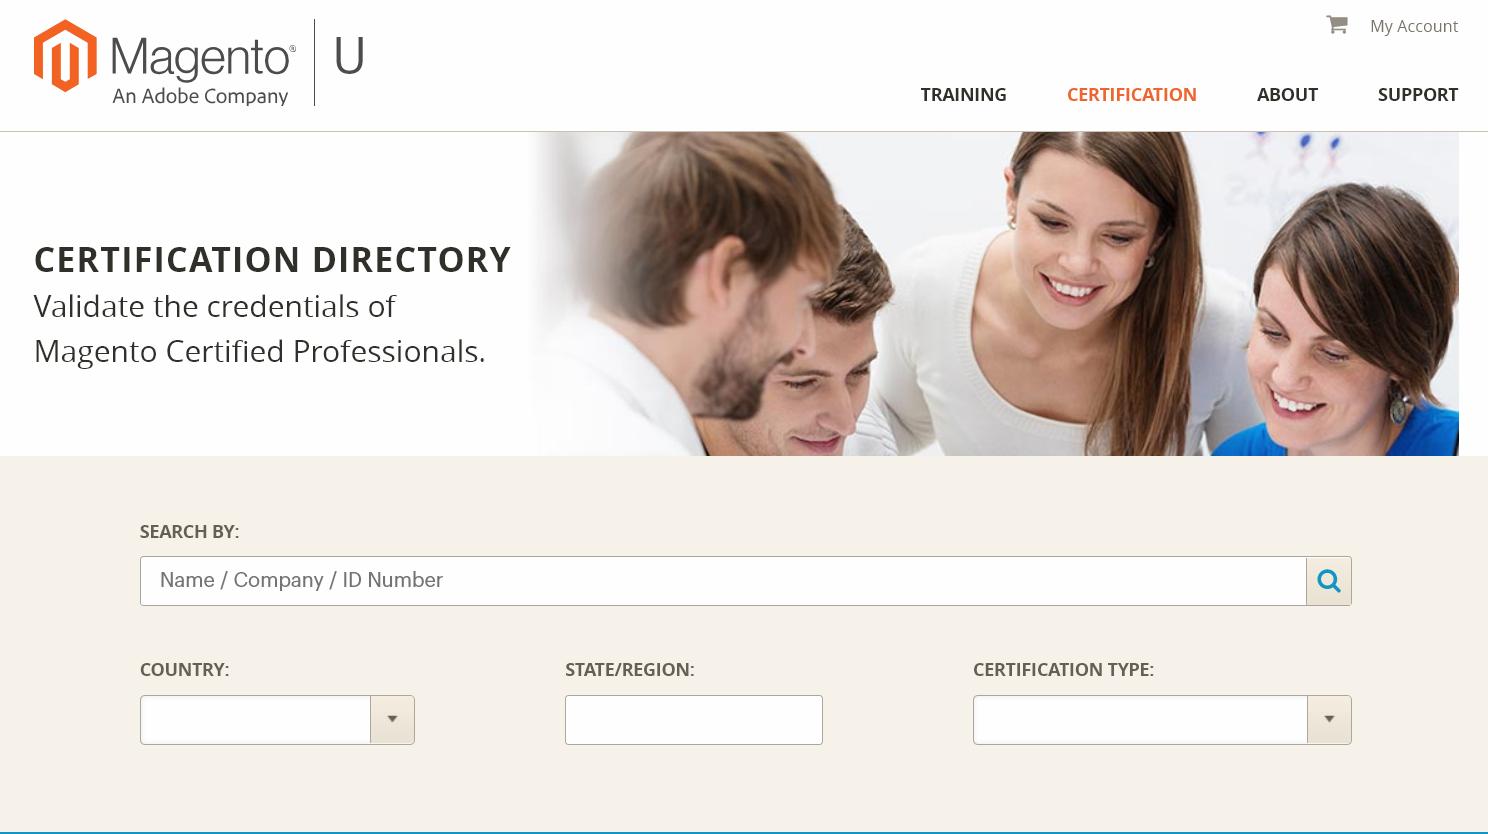 Magento Certifications - Magento U